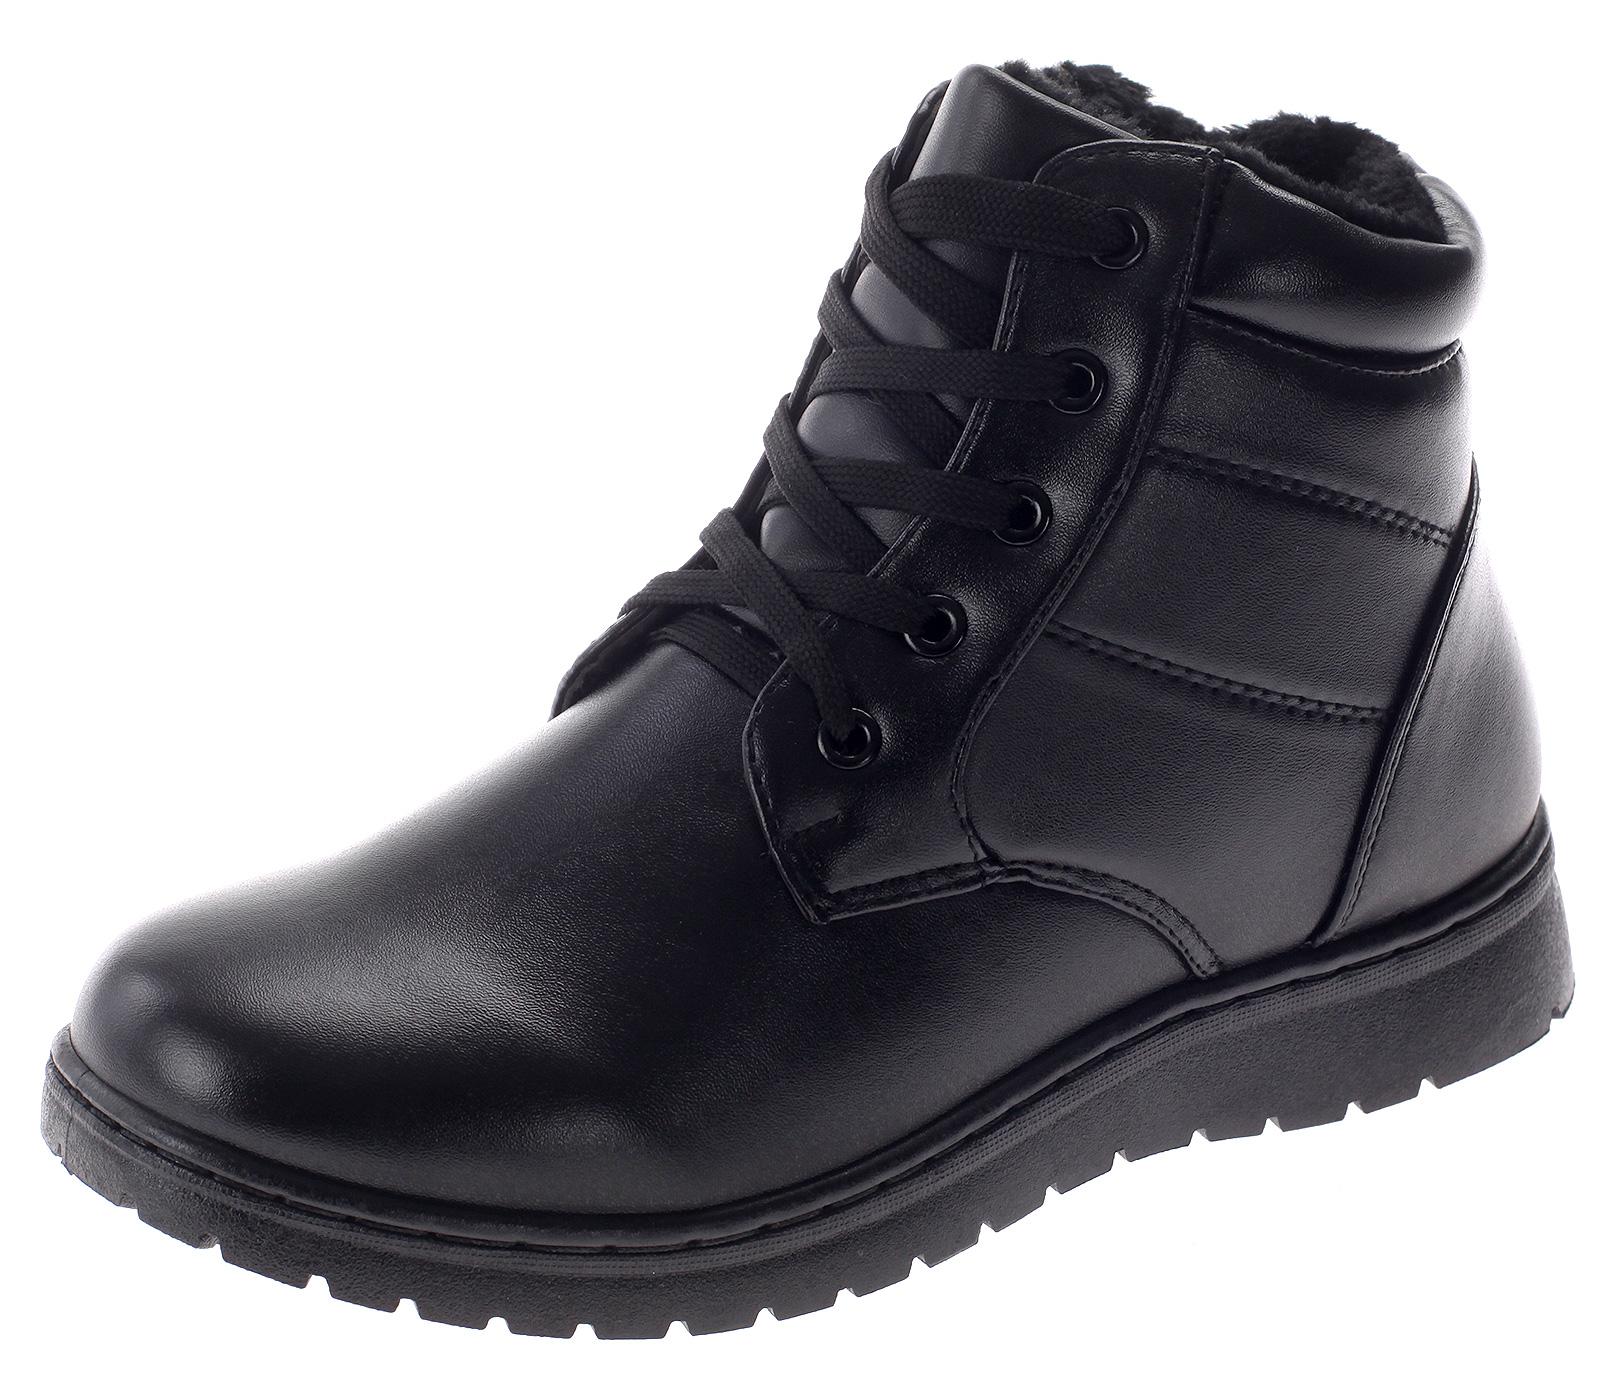 Damen Stiefeletten Winterschuhe Stiefel Warm gefütterte Schuhe Boots Booty KF01